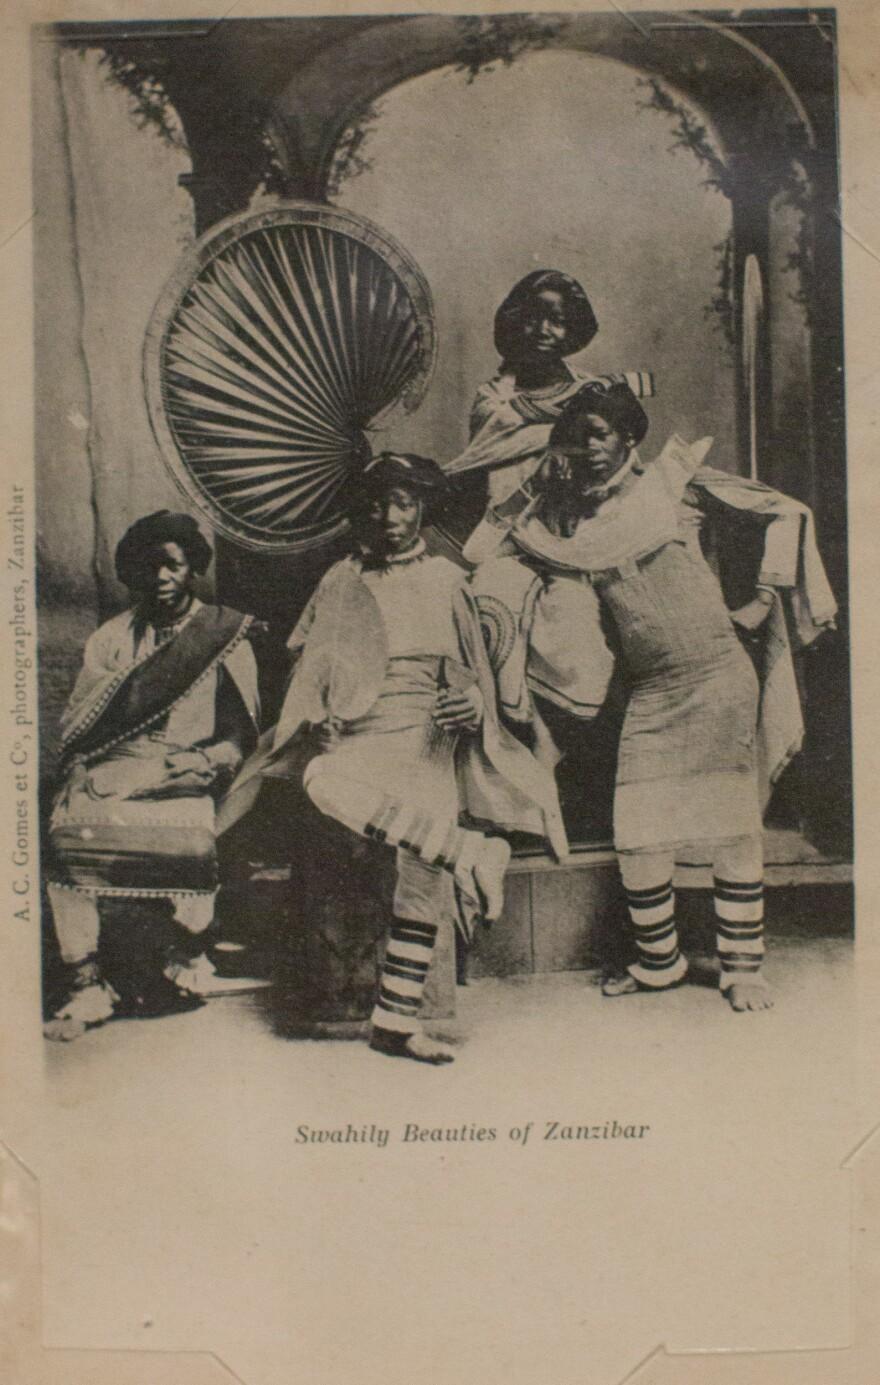 <em>Swahily Beauties of Zanzibar</em> by A.C. Gomes & Co. Photograph taken before 1900; postcard printed circa 1903-1904.